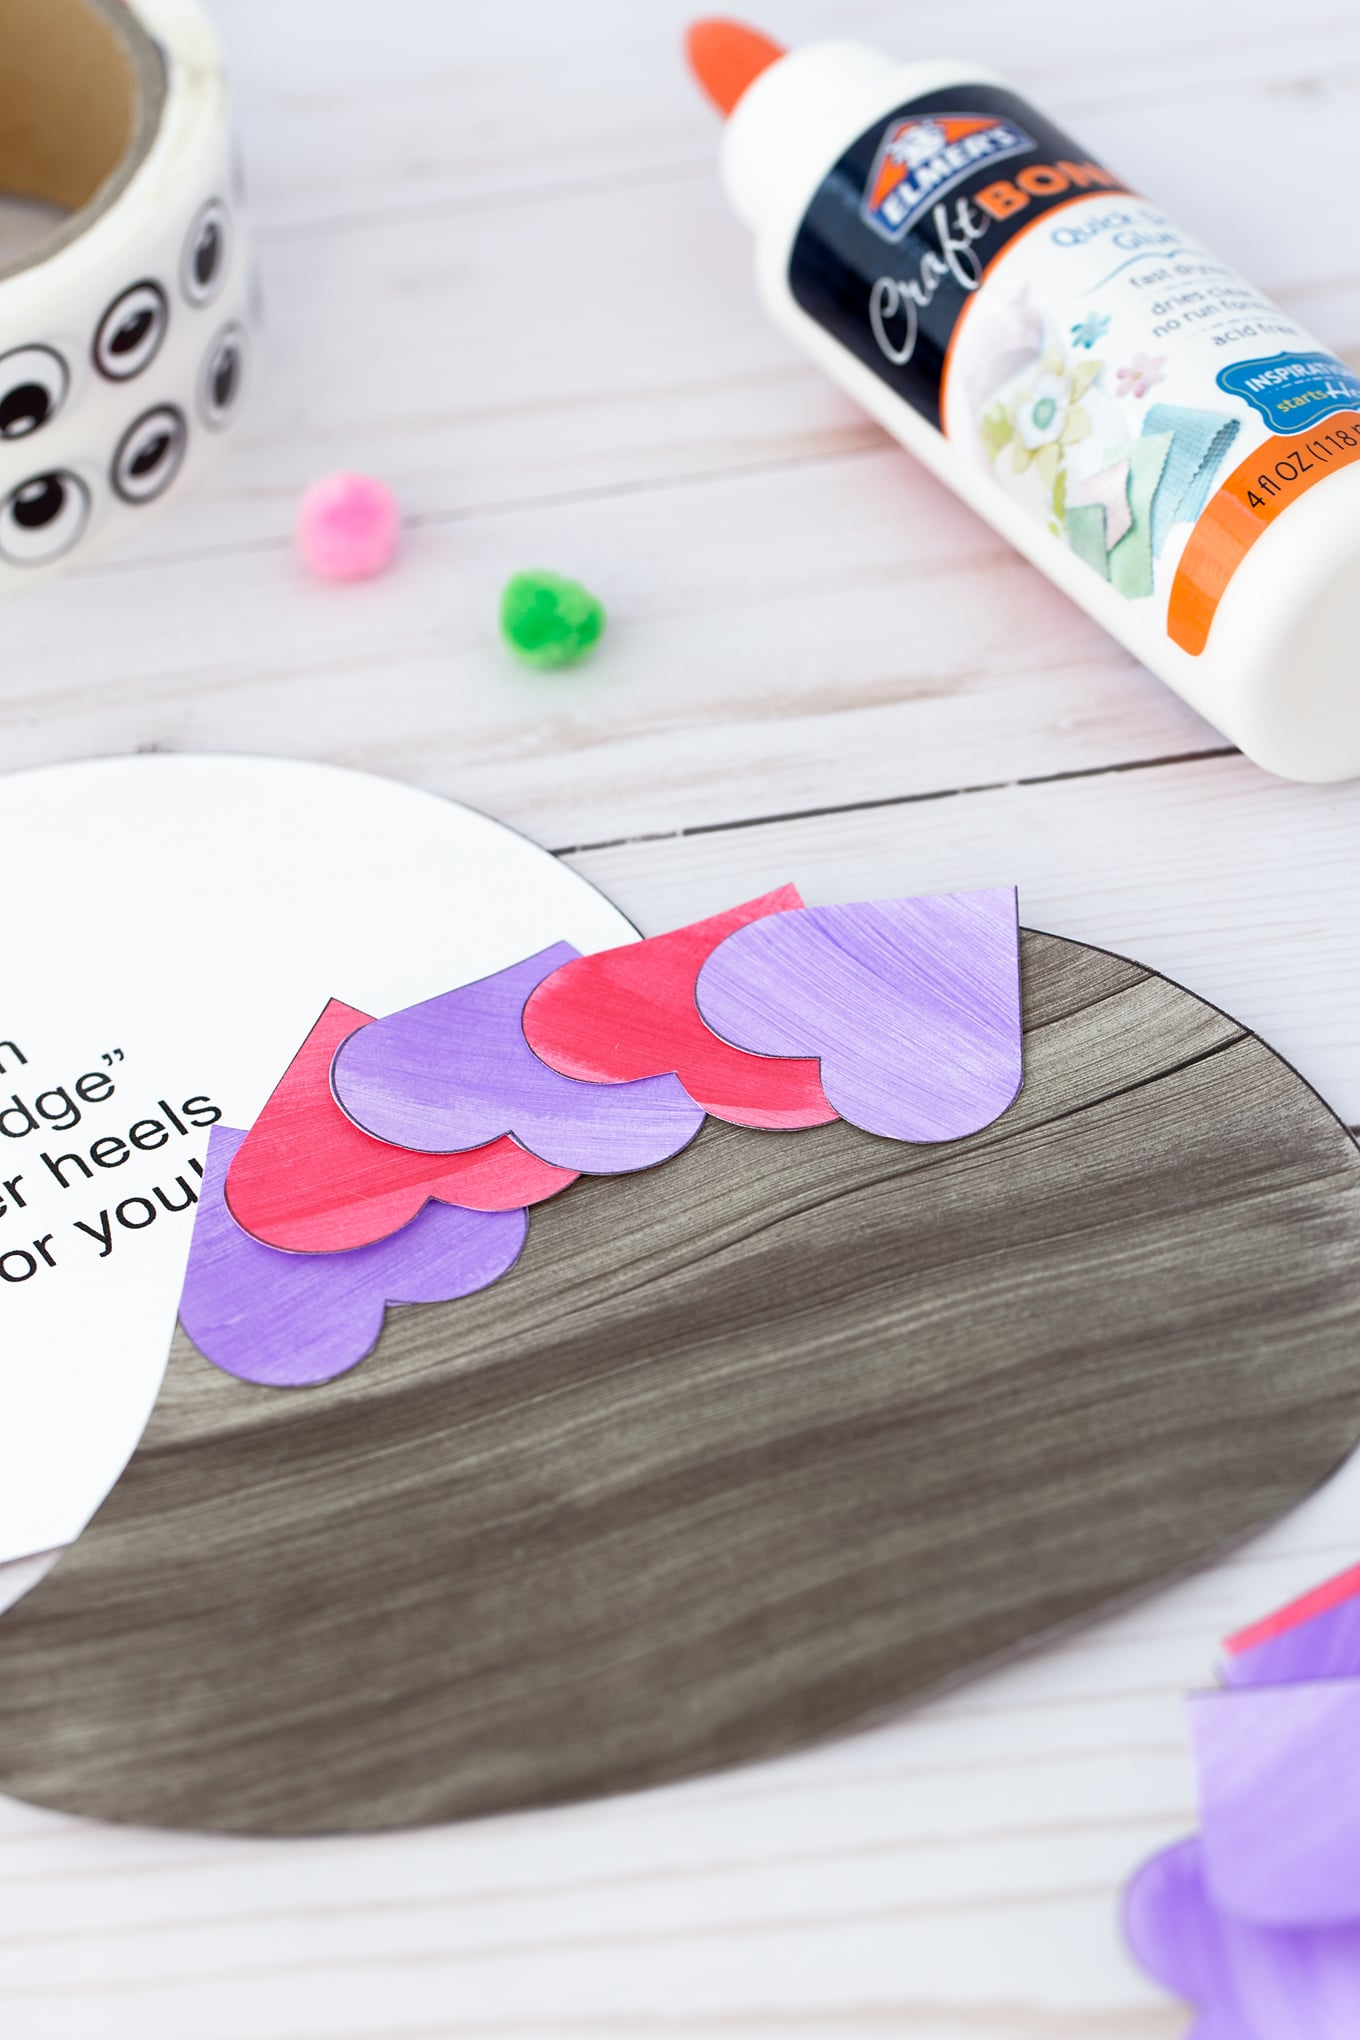 Valentine Hedgehog Card In-Process